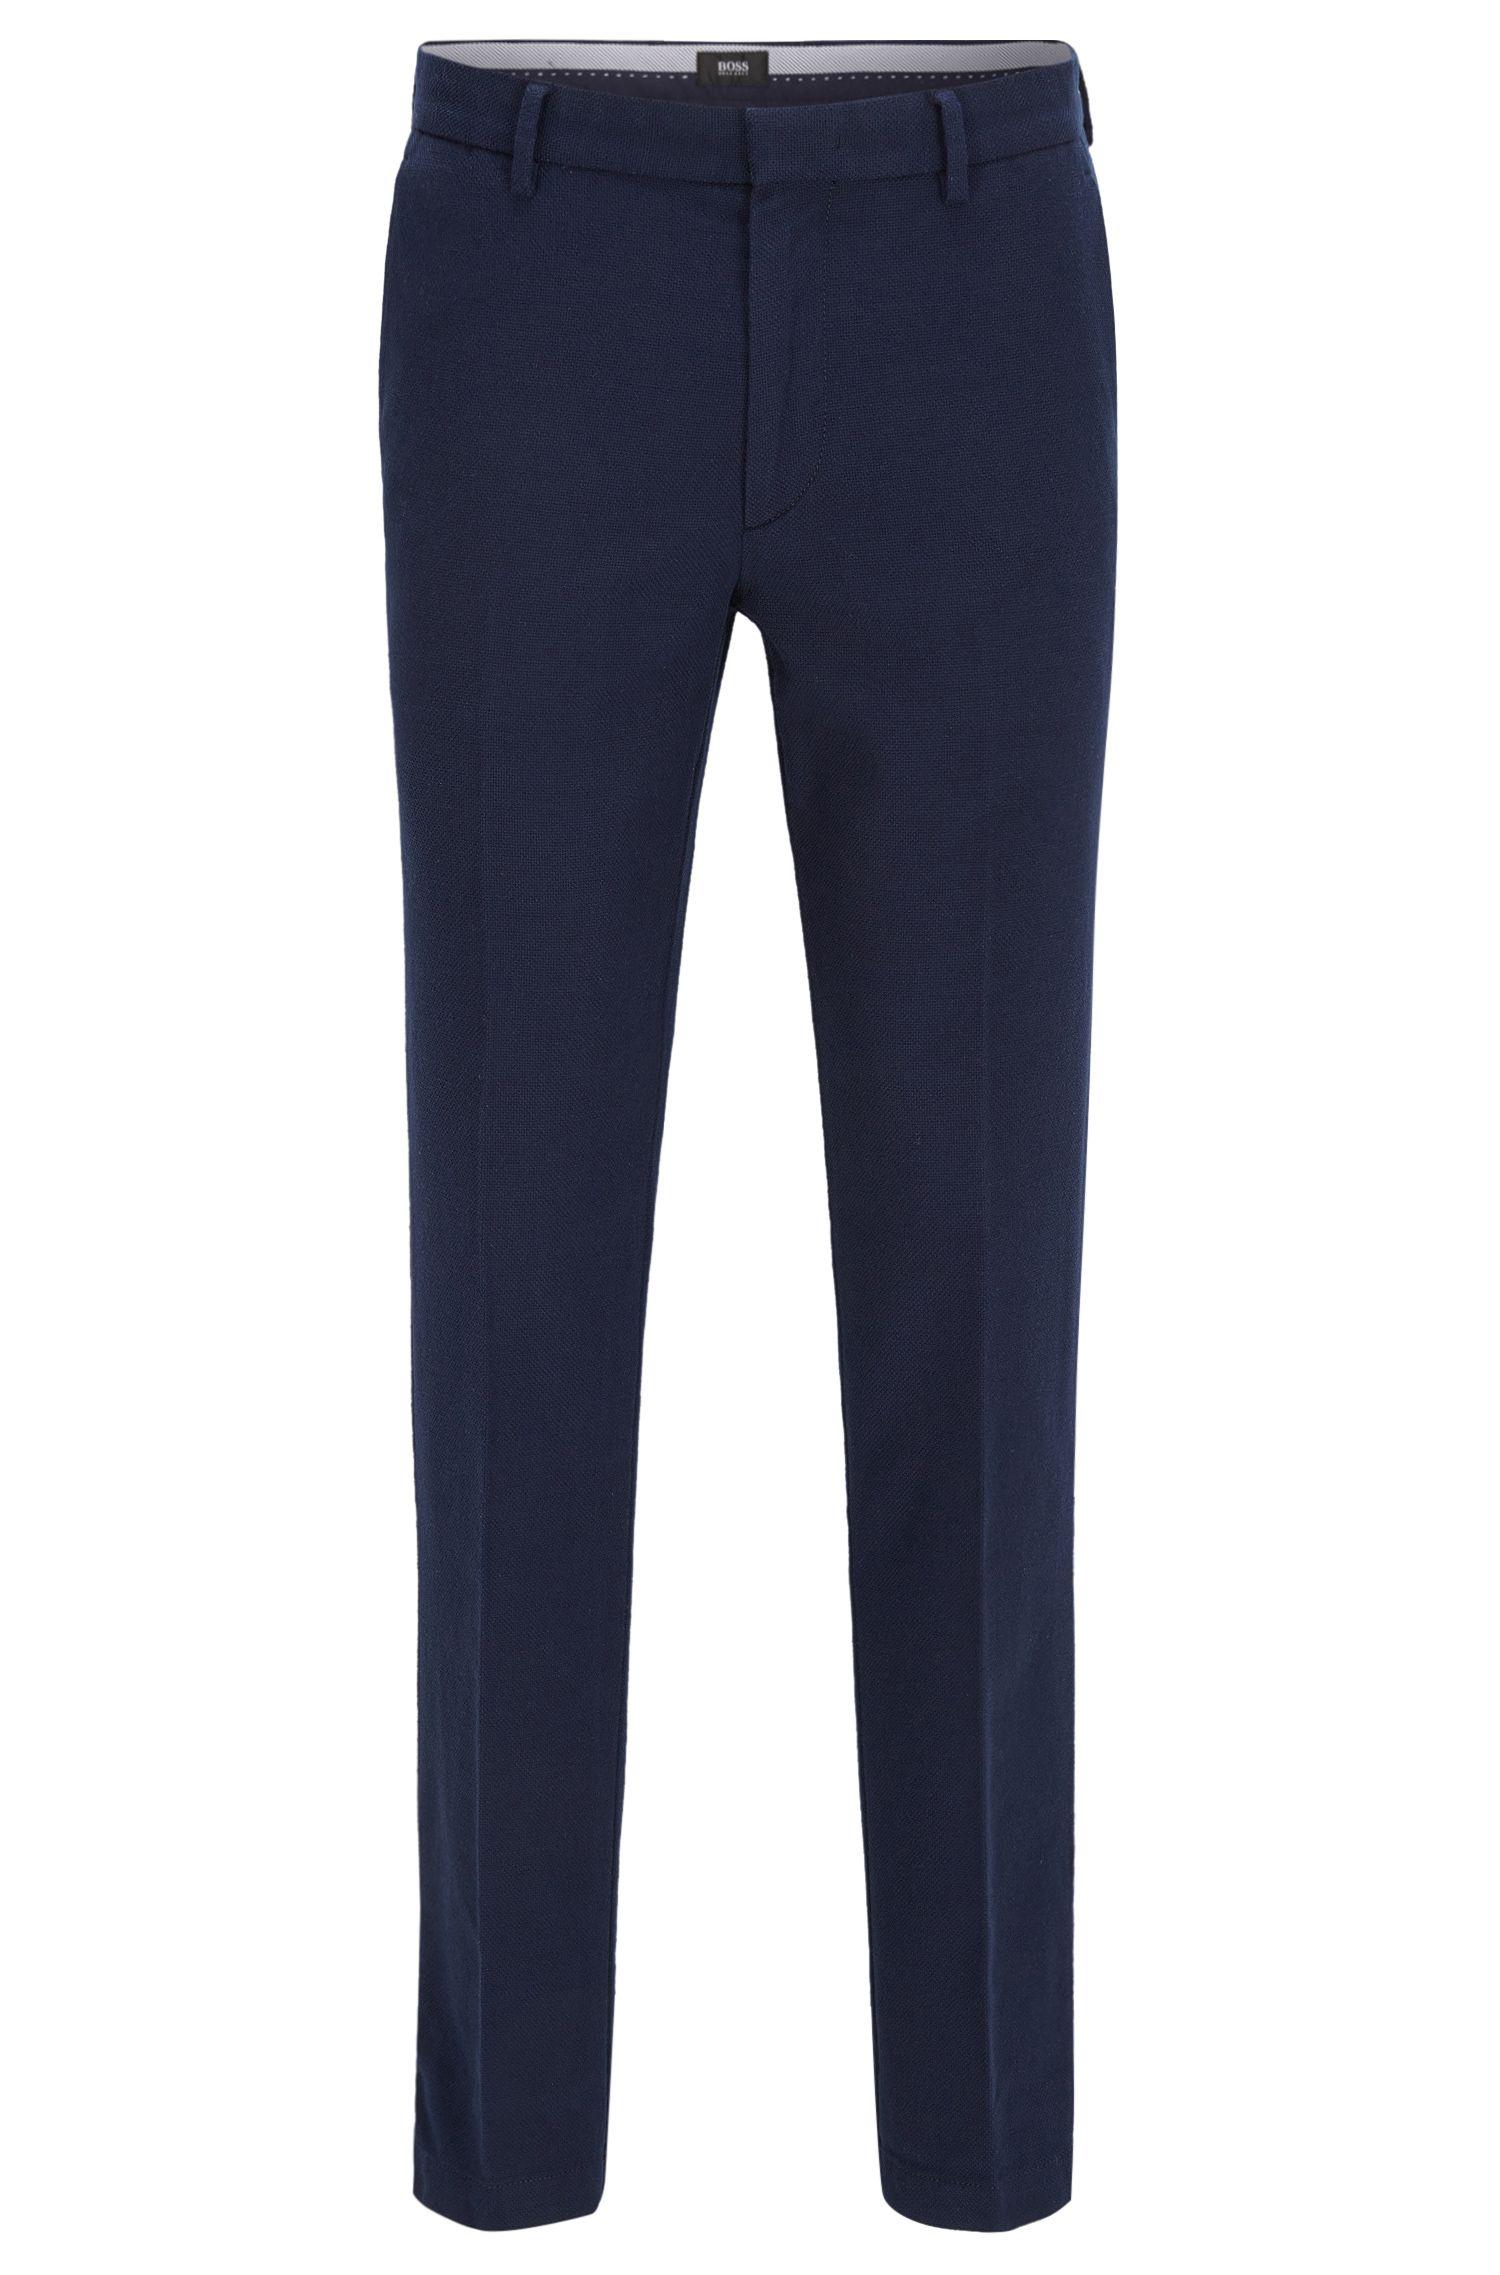 Slim-fit chinos in textured stretch cotton